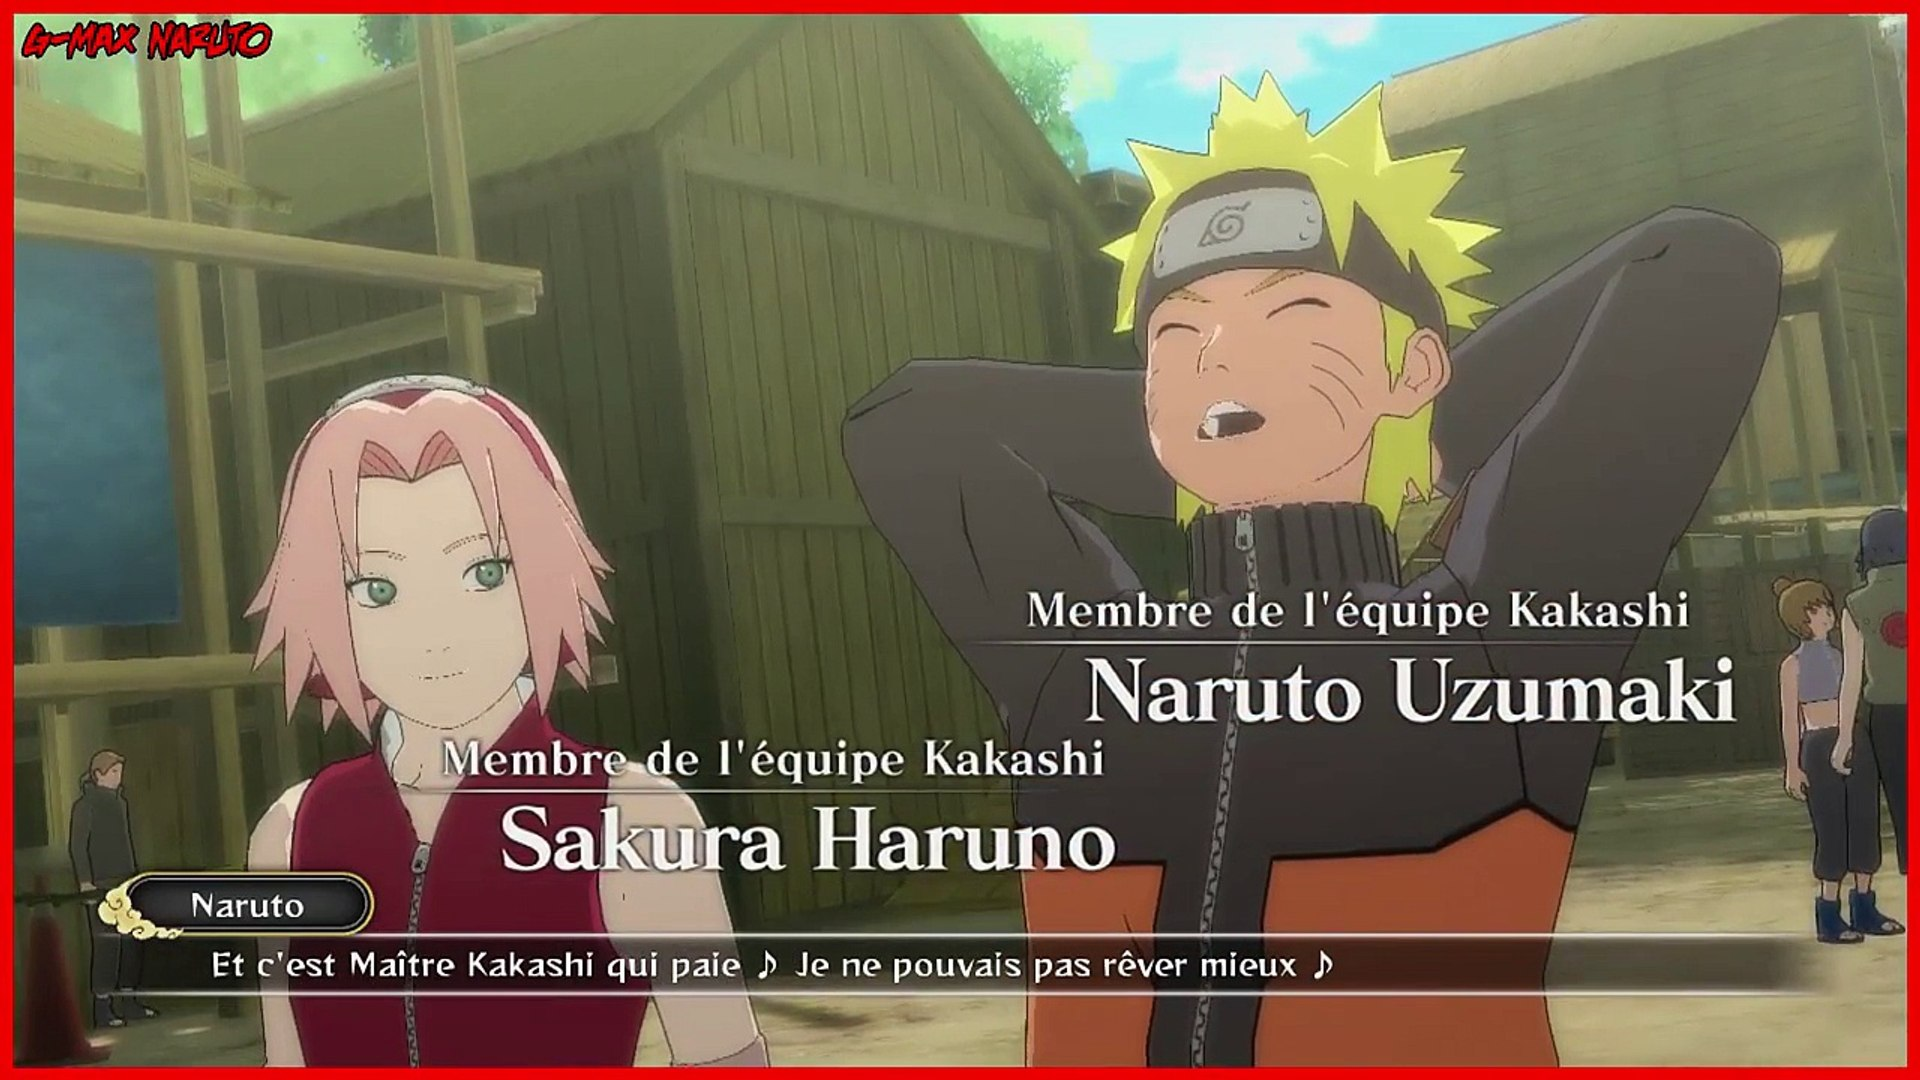 Naruto Shippuden ultimate ninja storm 3 full burst fr - francais - Lets Play : Episode 1 F